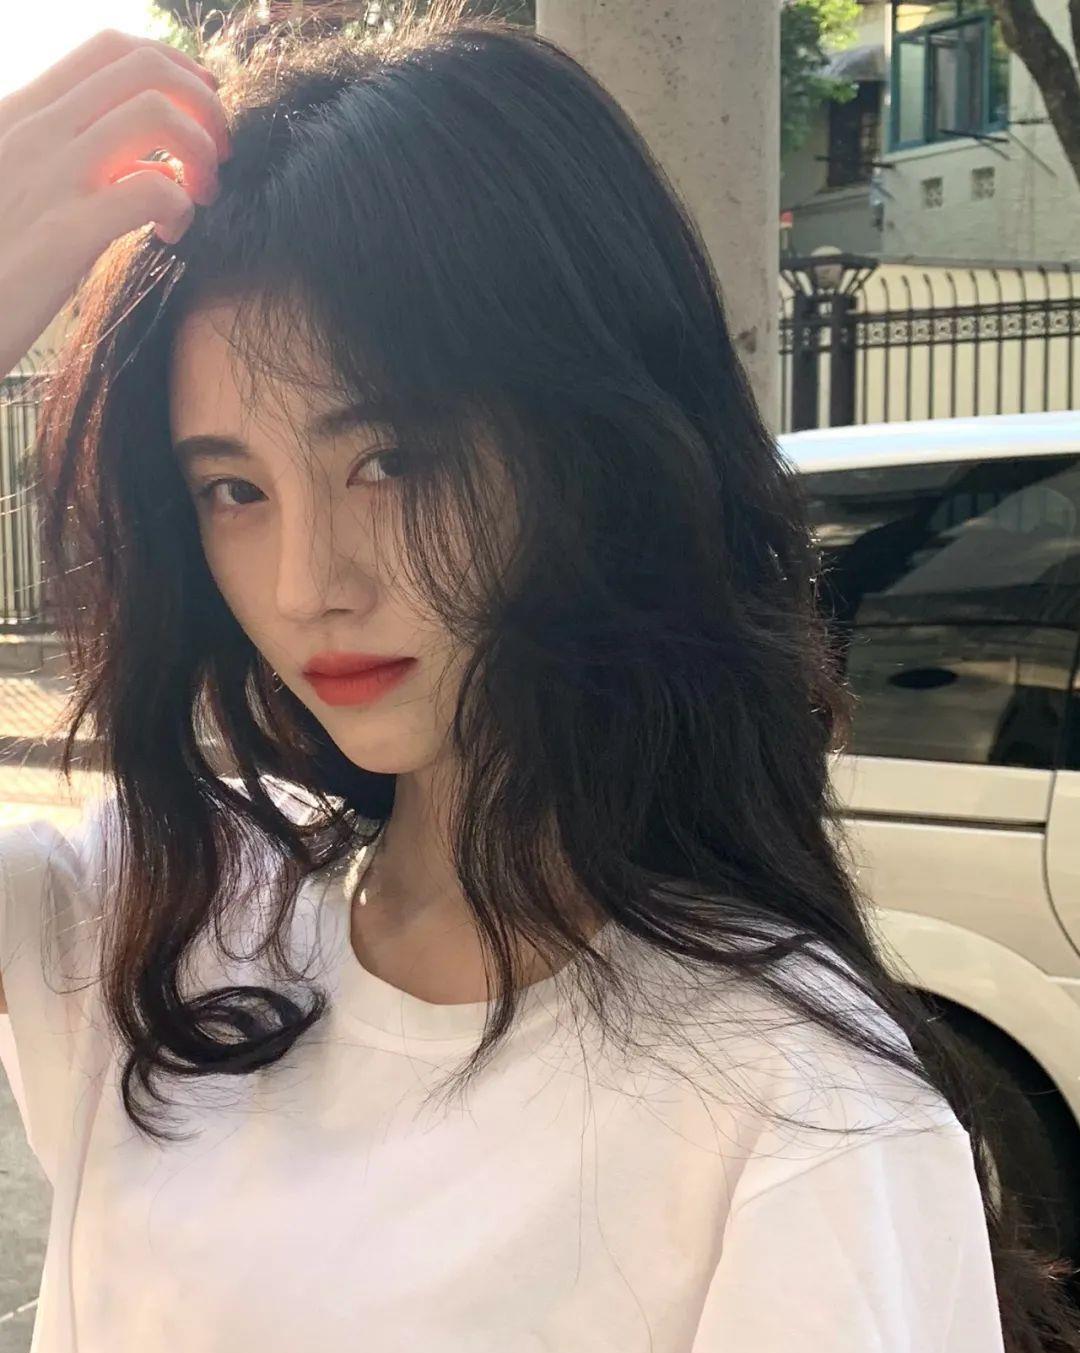 Blackpink,蒋欣,陈乔恩,鞠婧祎,圆脸小花